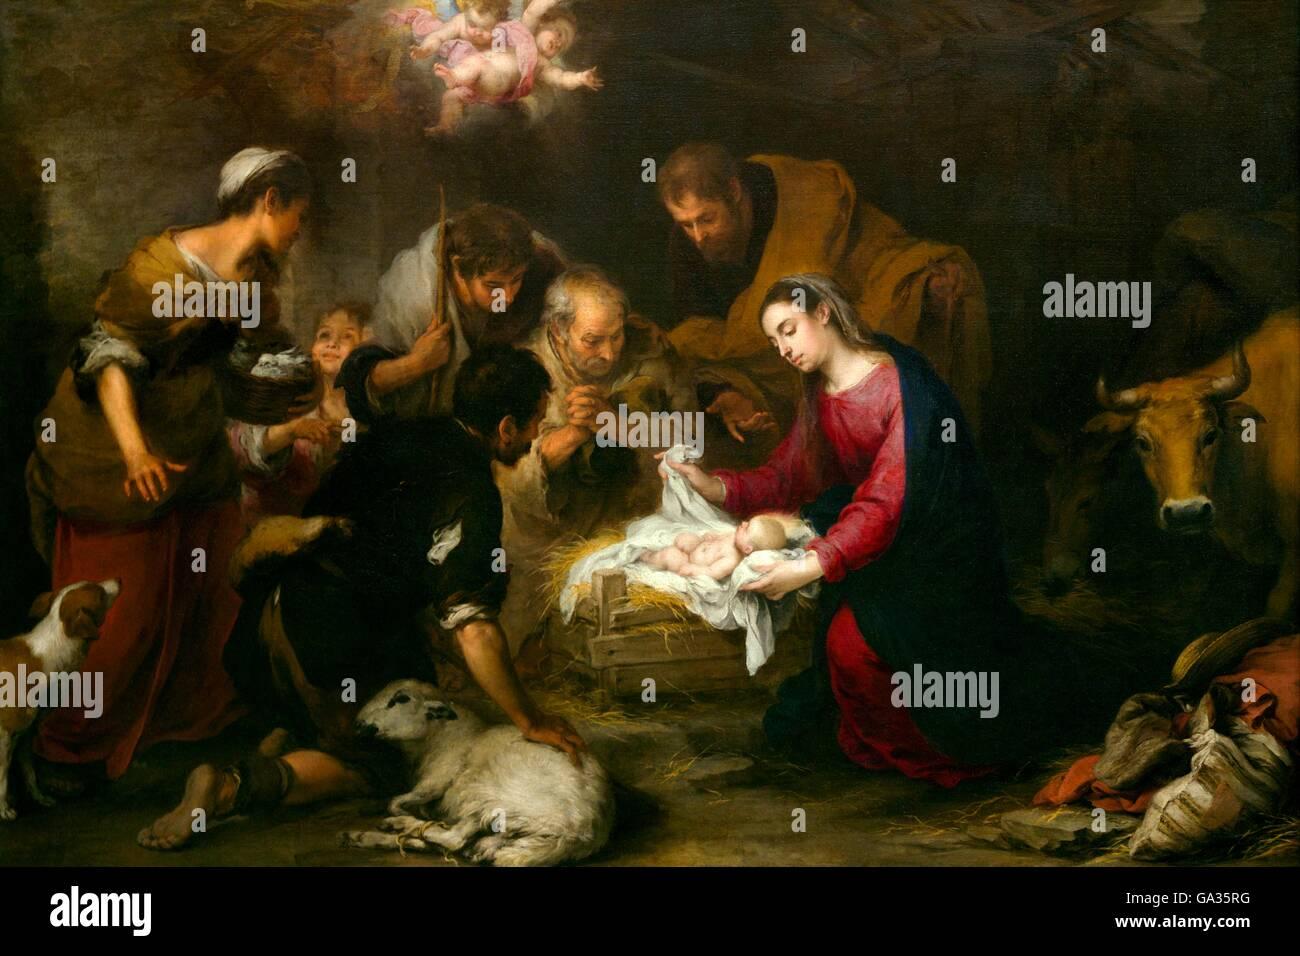 Adoration of the Shepherds, by Bartholomew Murillo, Wallace Collection, London, England, UK, GB, Europe - Stock Image